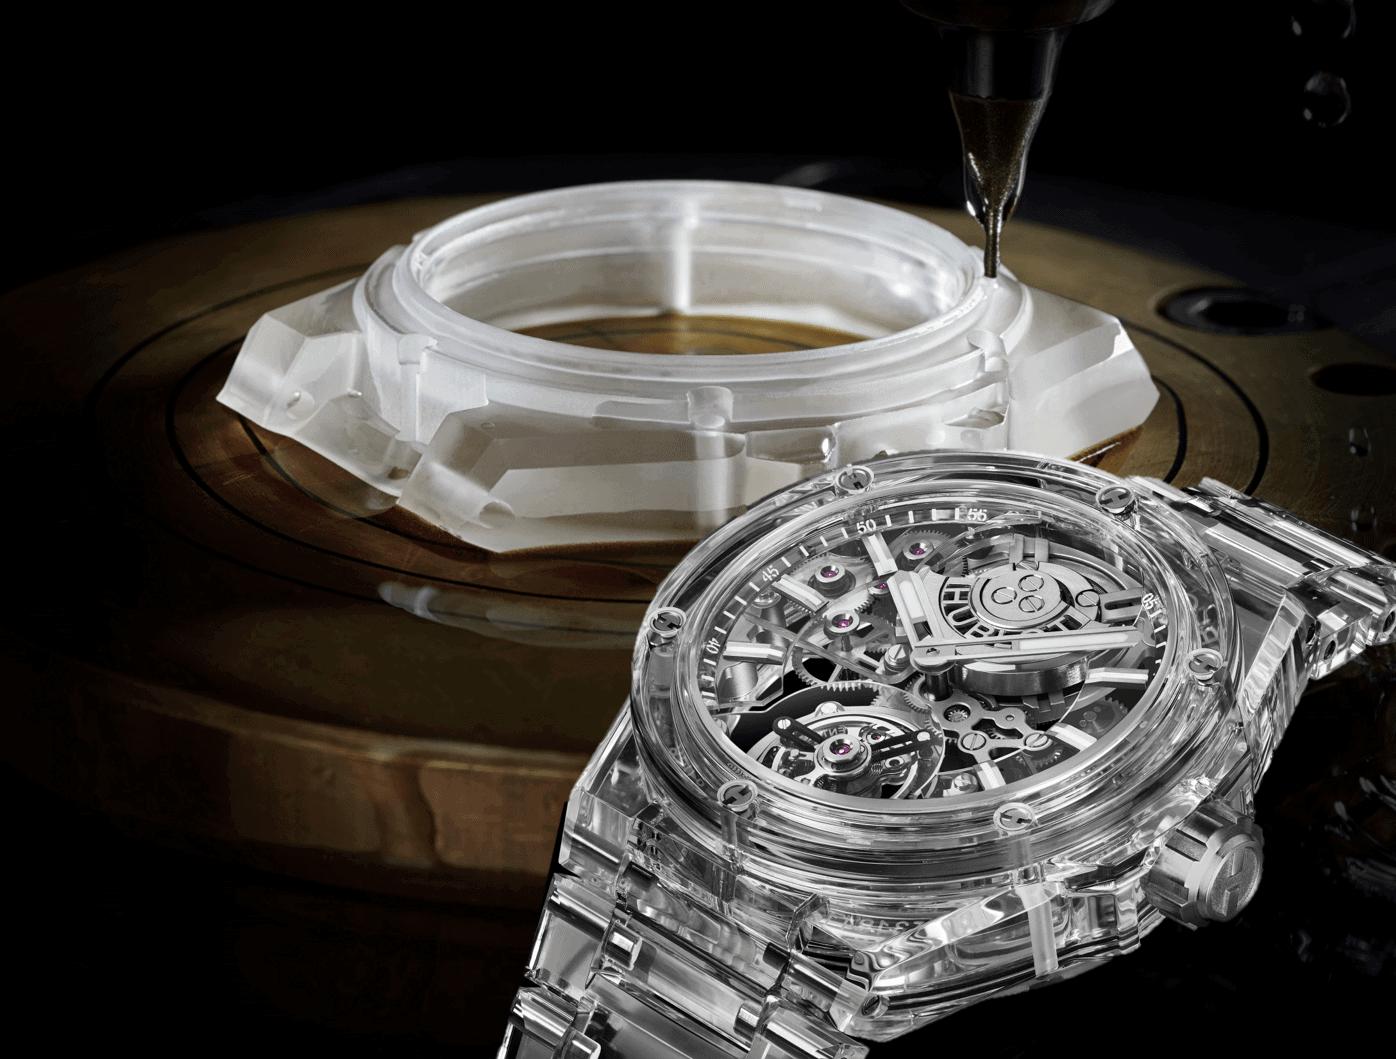 Transparente Uhr aus künstlichem SaphirHublot Big Bang Integral Tourbillon Full Sapphire